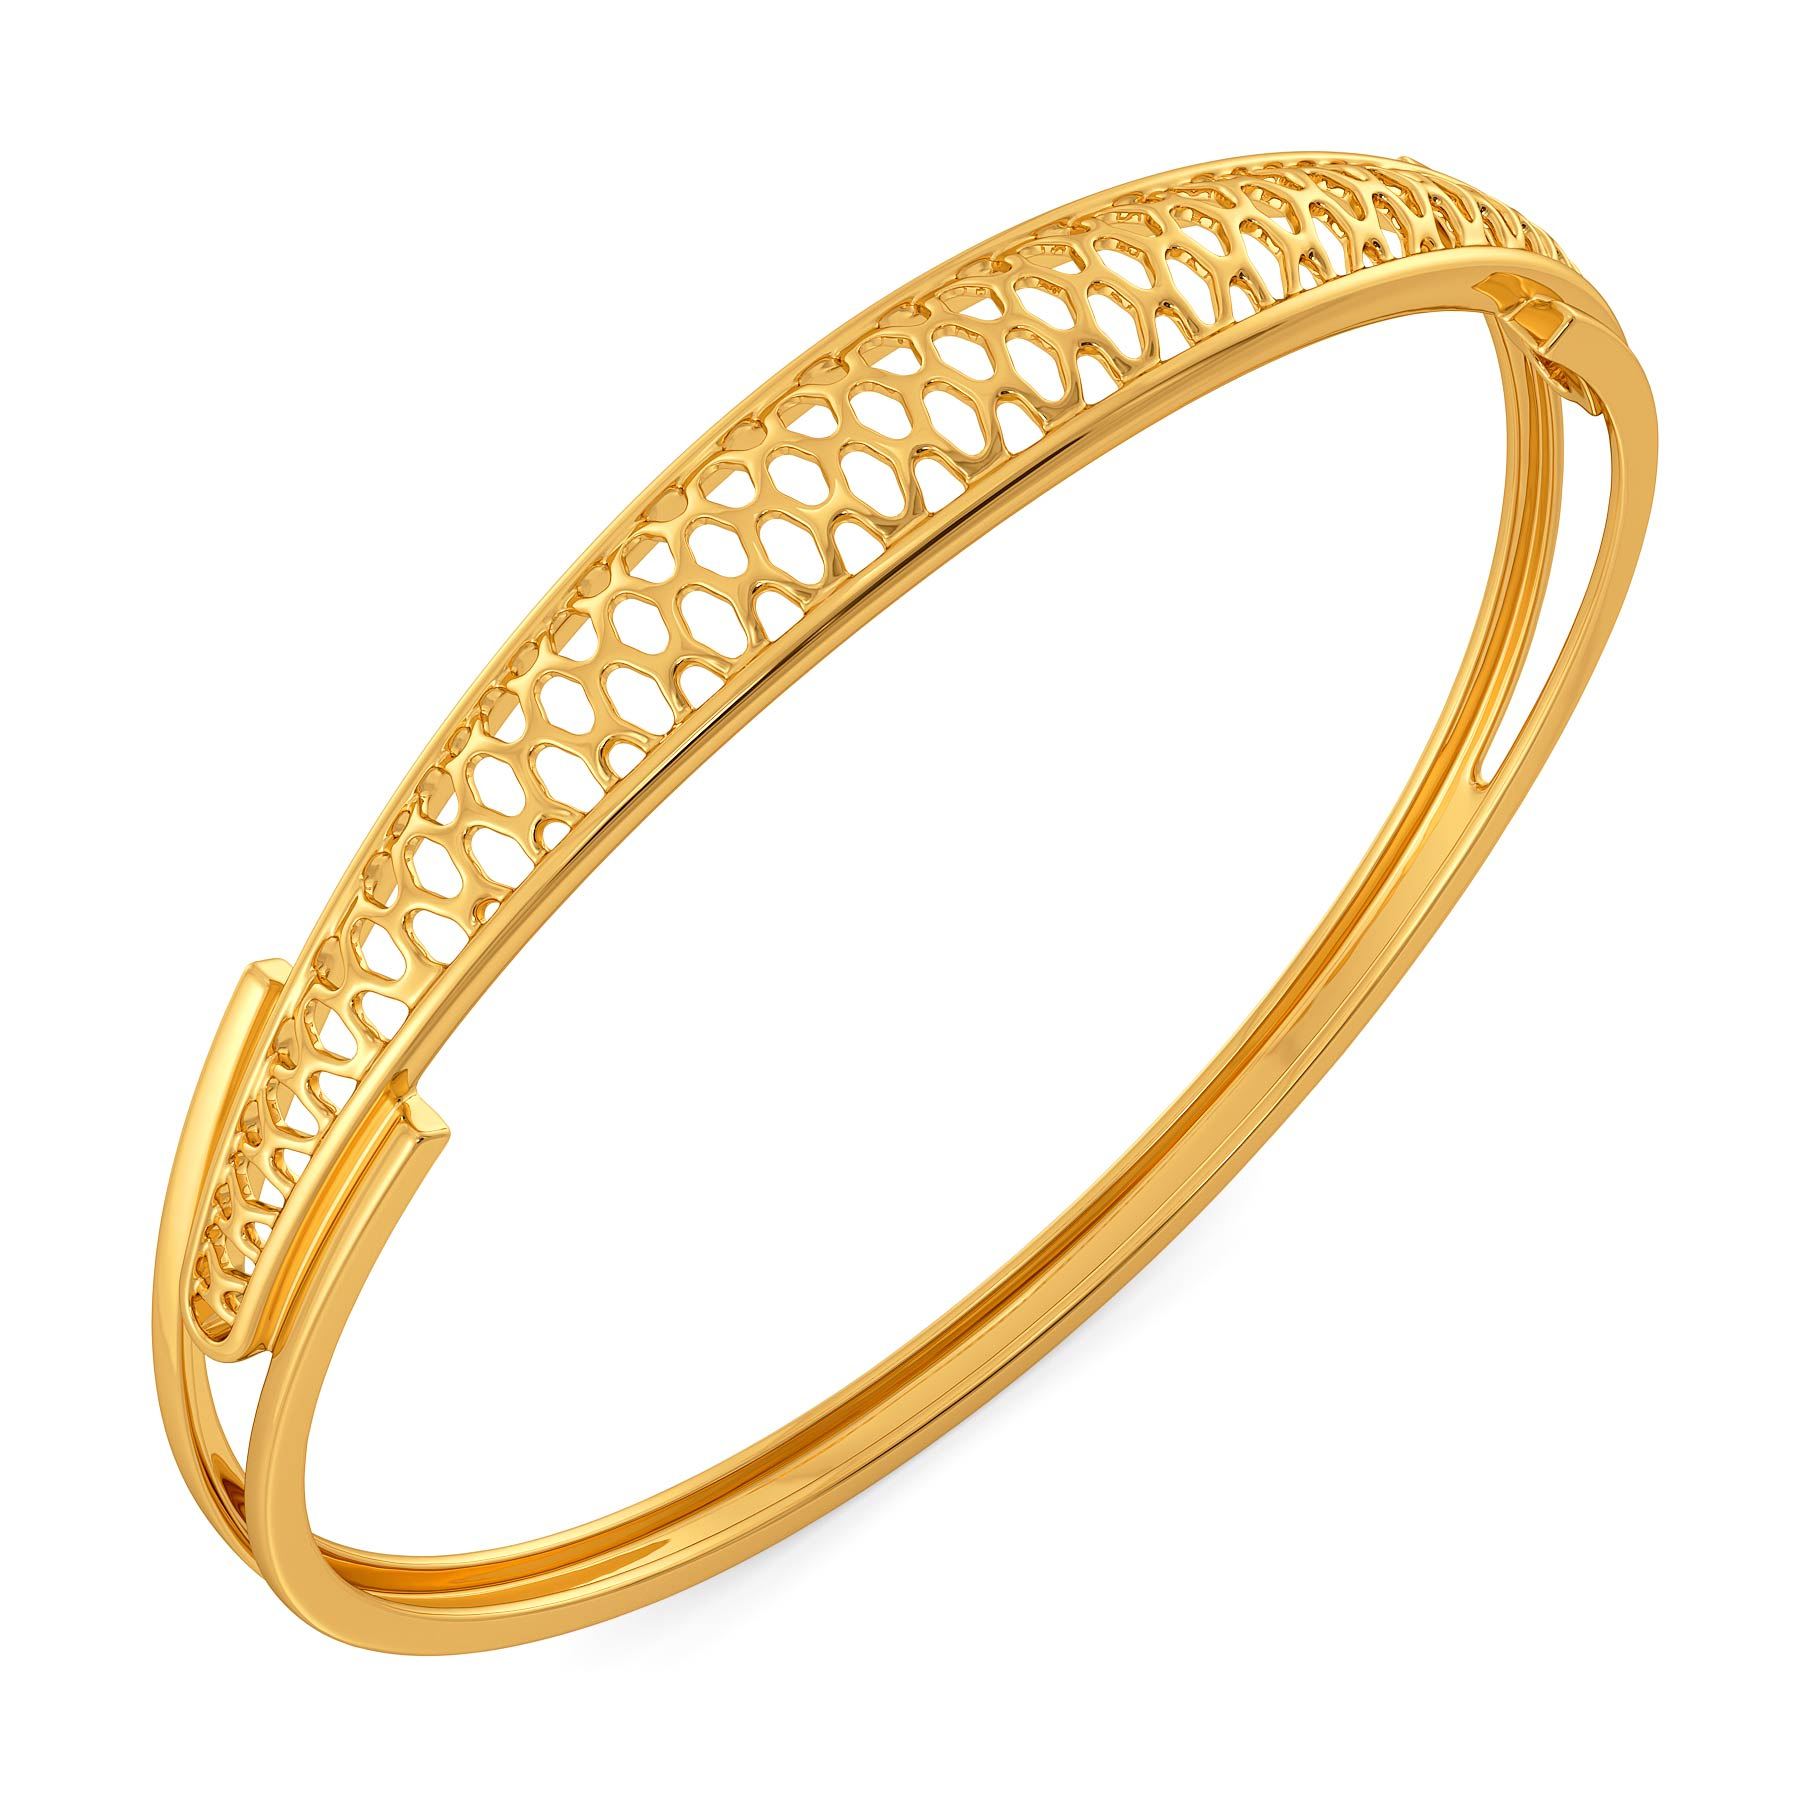 Bangles 40 gram designs gold Gold Plated